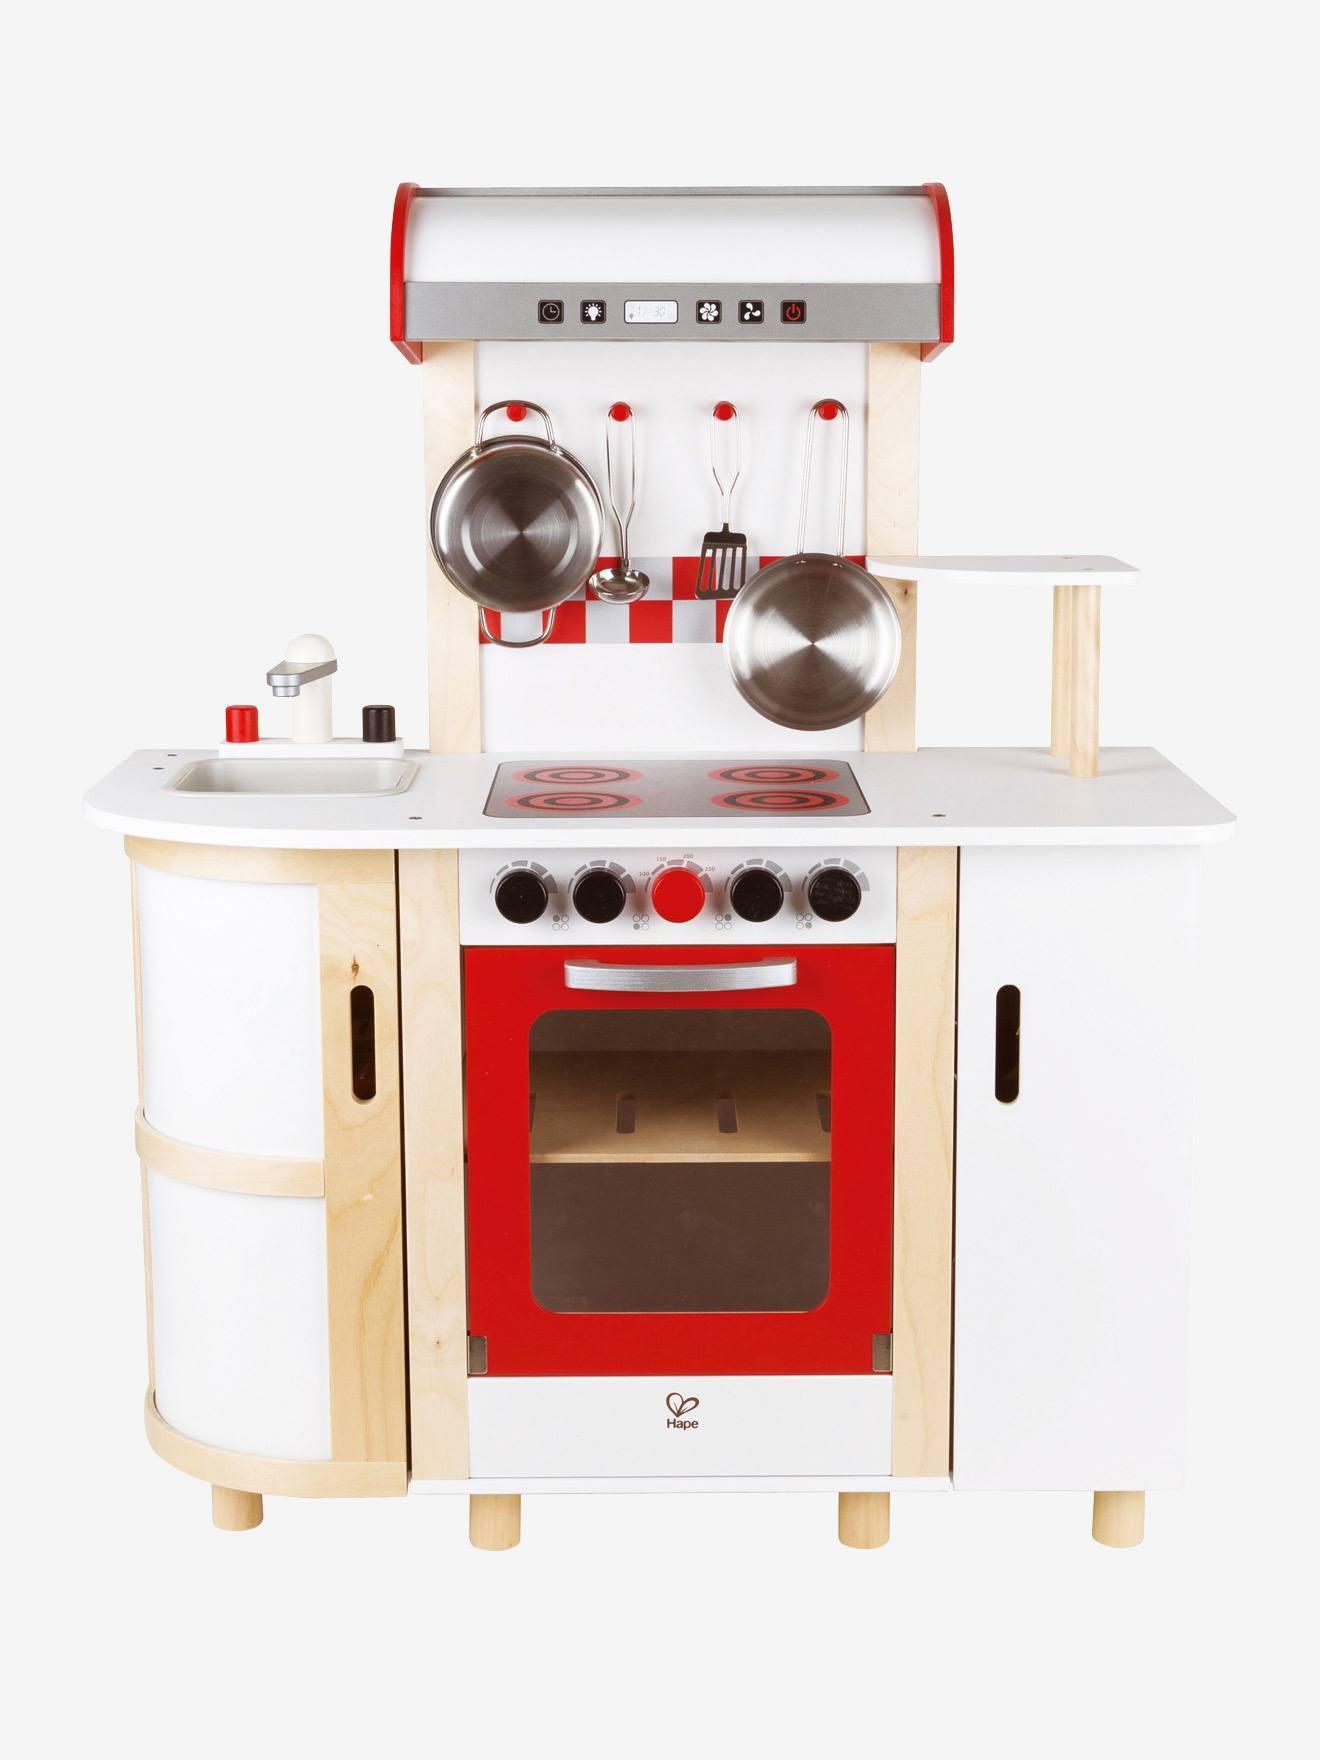 Hape Large Wooden Play Kitchenette, Toys | Vertbaudet